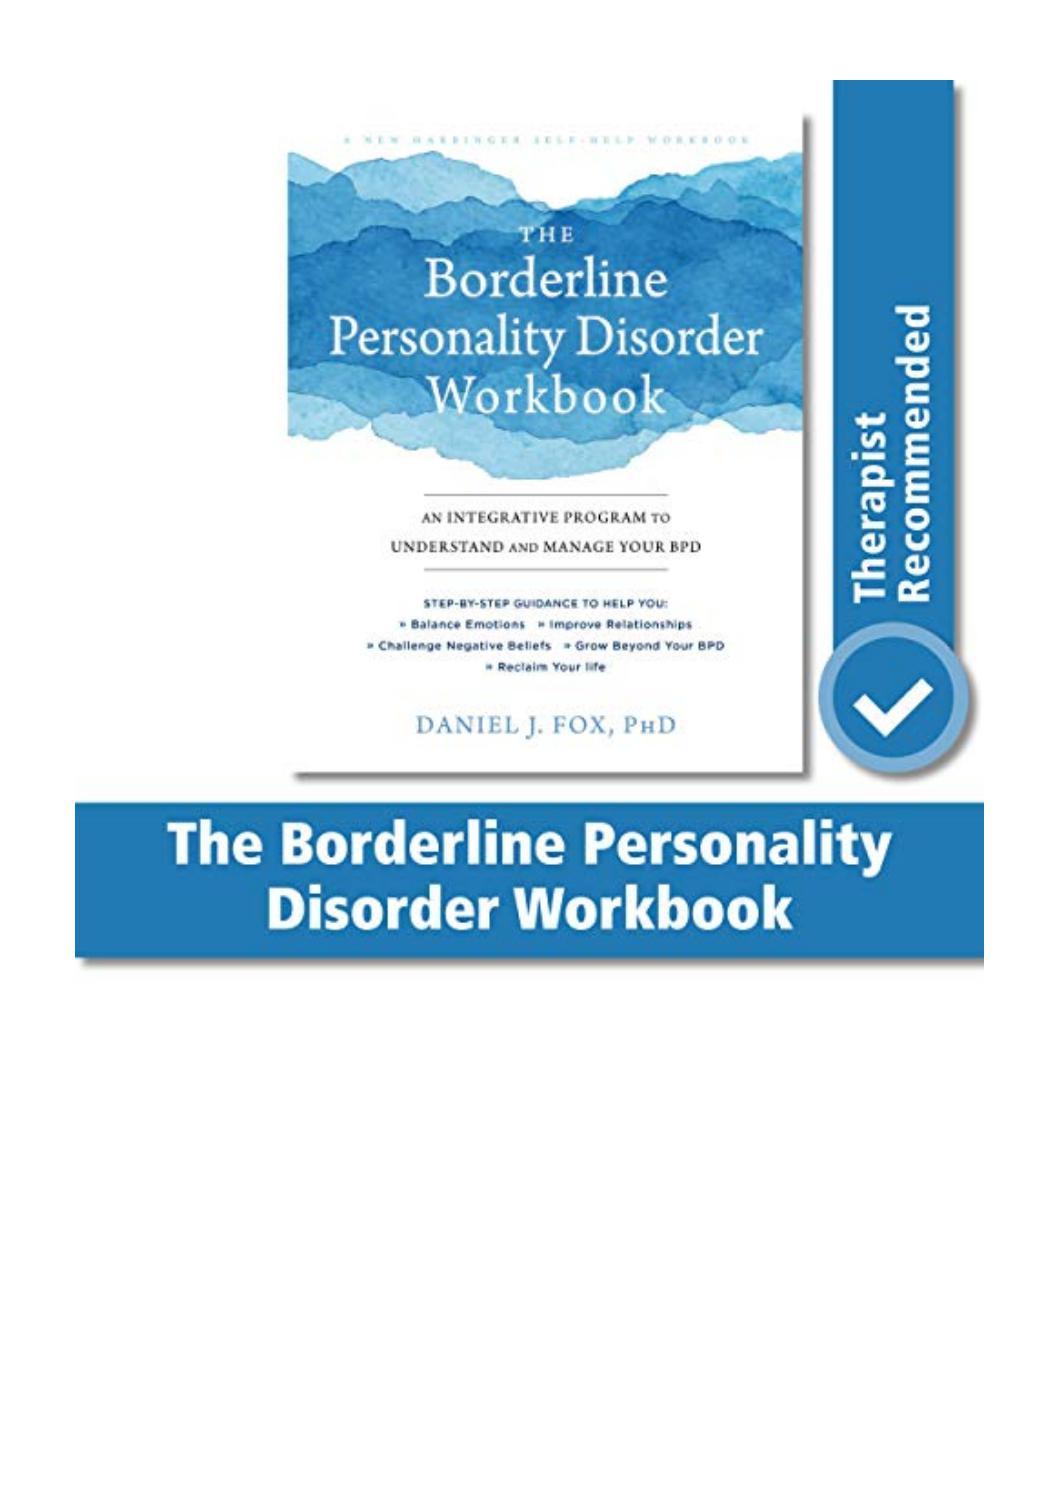 Borderline Personality Disorder Workbook Pdf Free